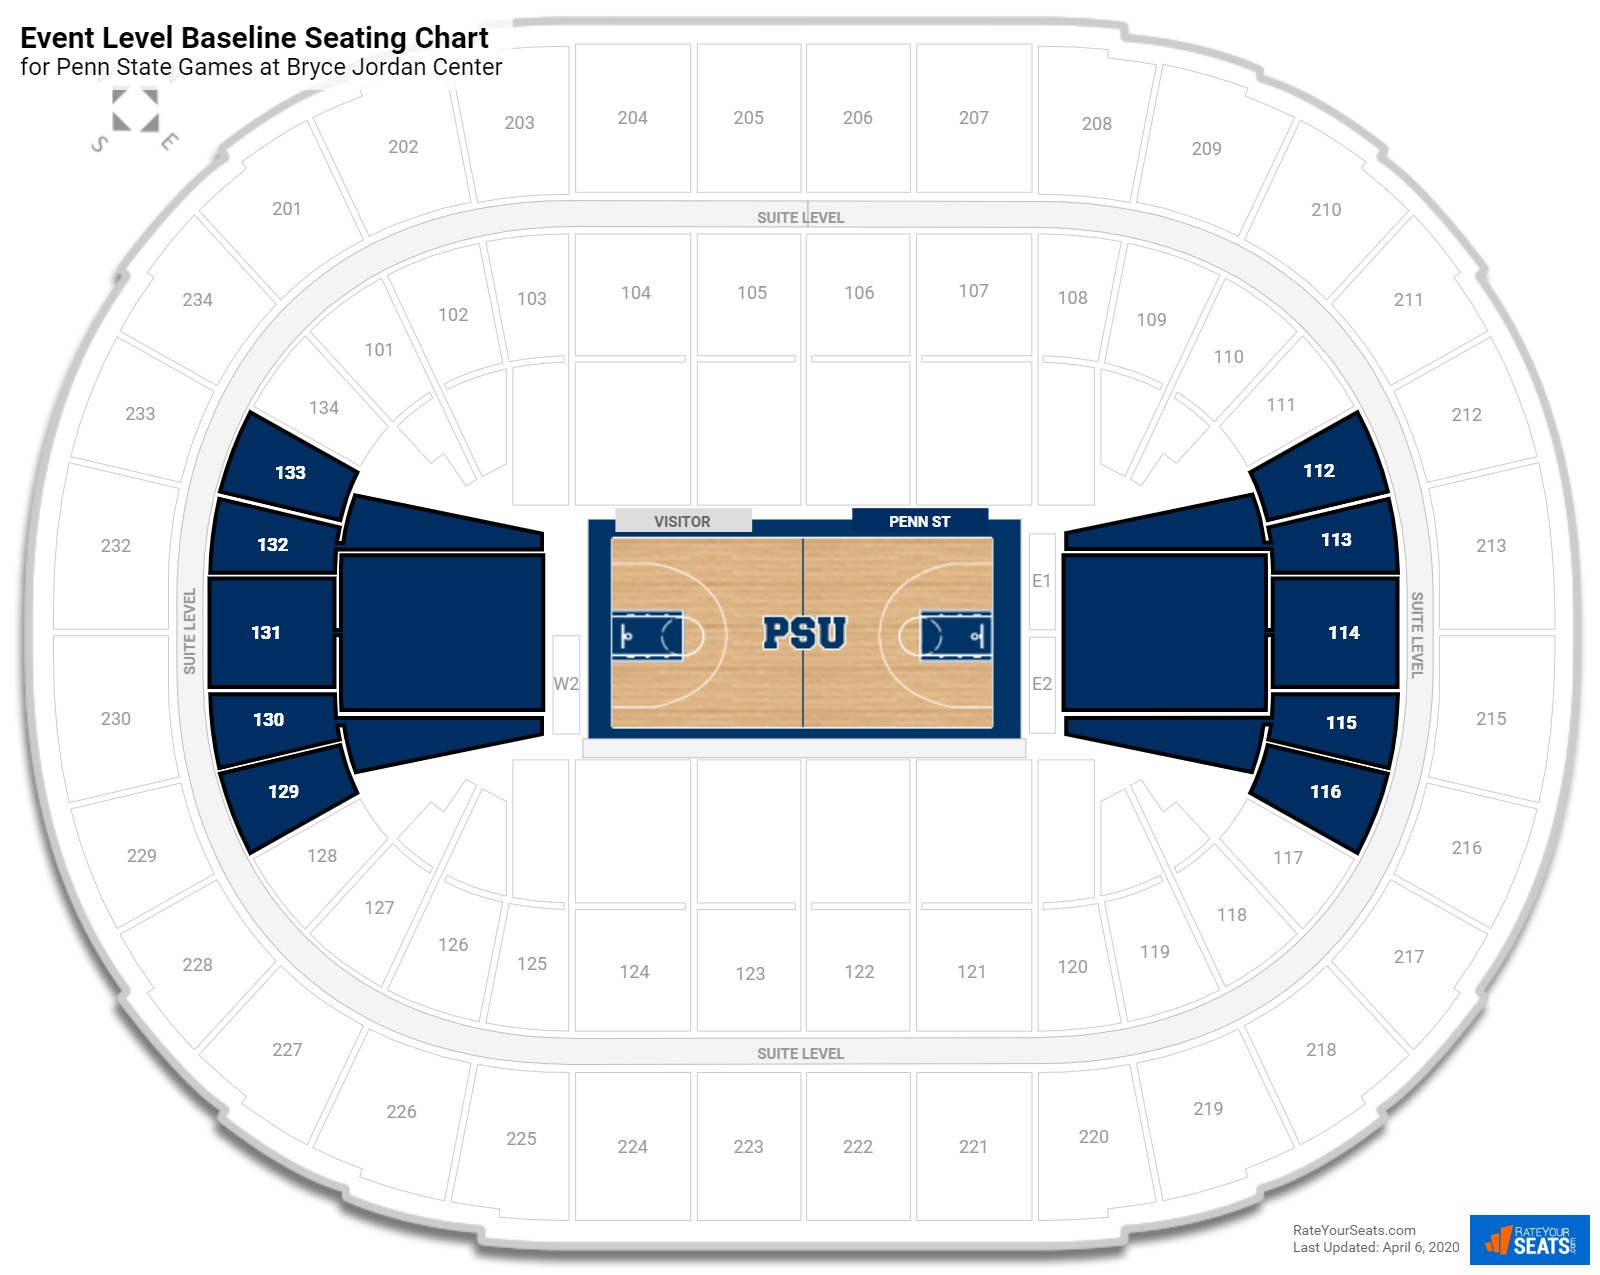 Bryce Jordan Center Event Level Baseline Seating Chart